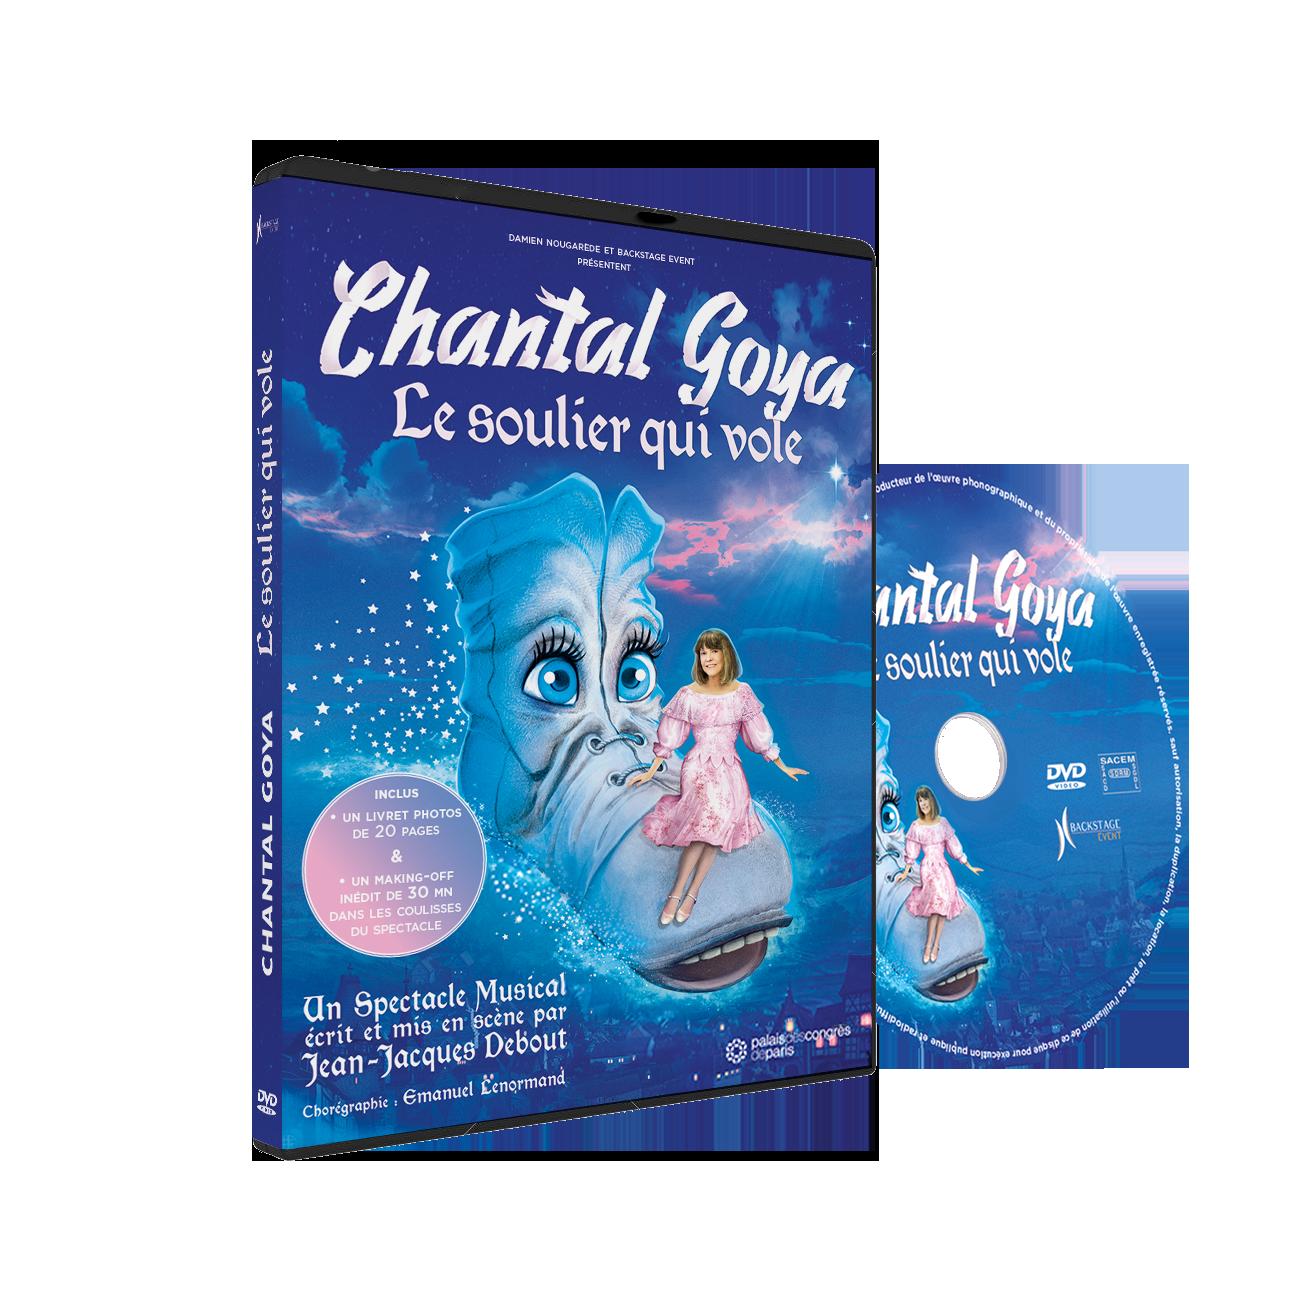 DVD - CHANTAL GOYA - LE SOULIER QUI VOLE